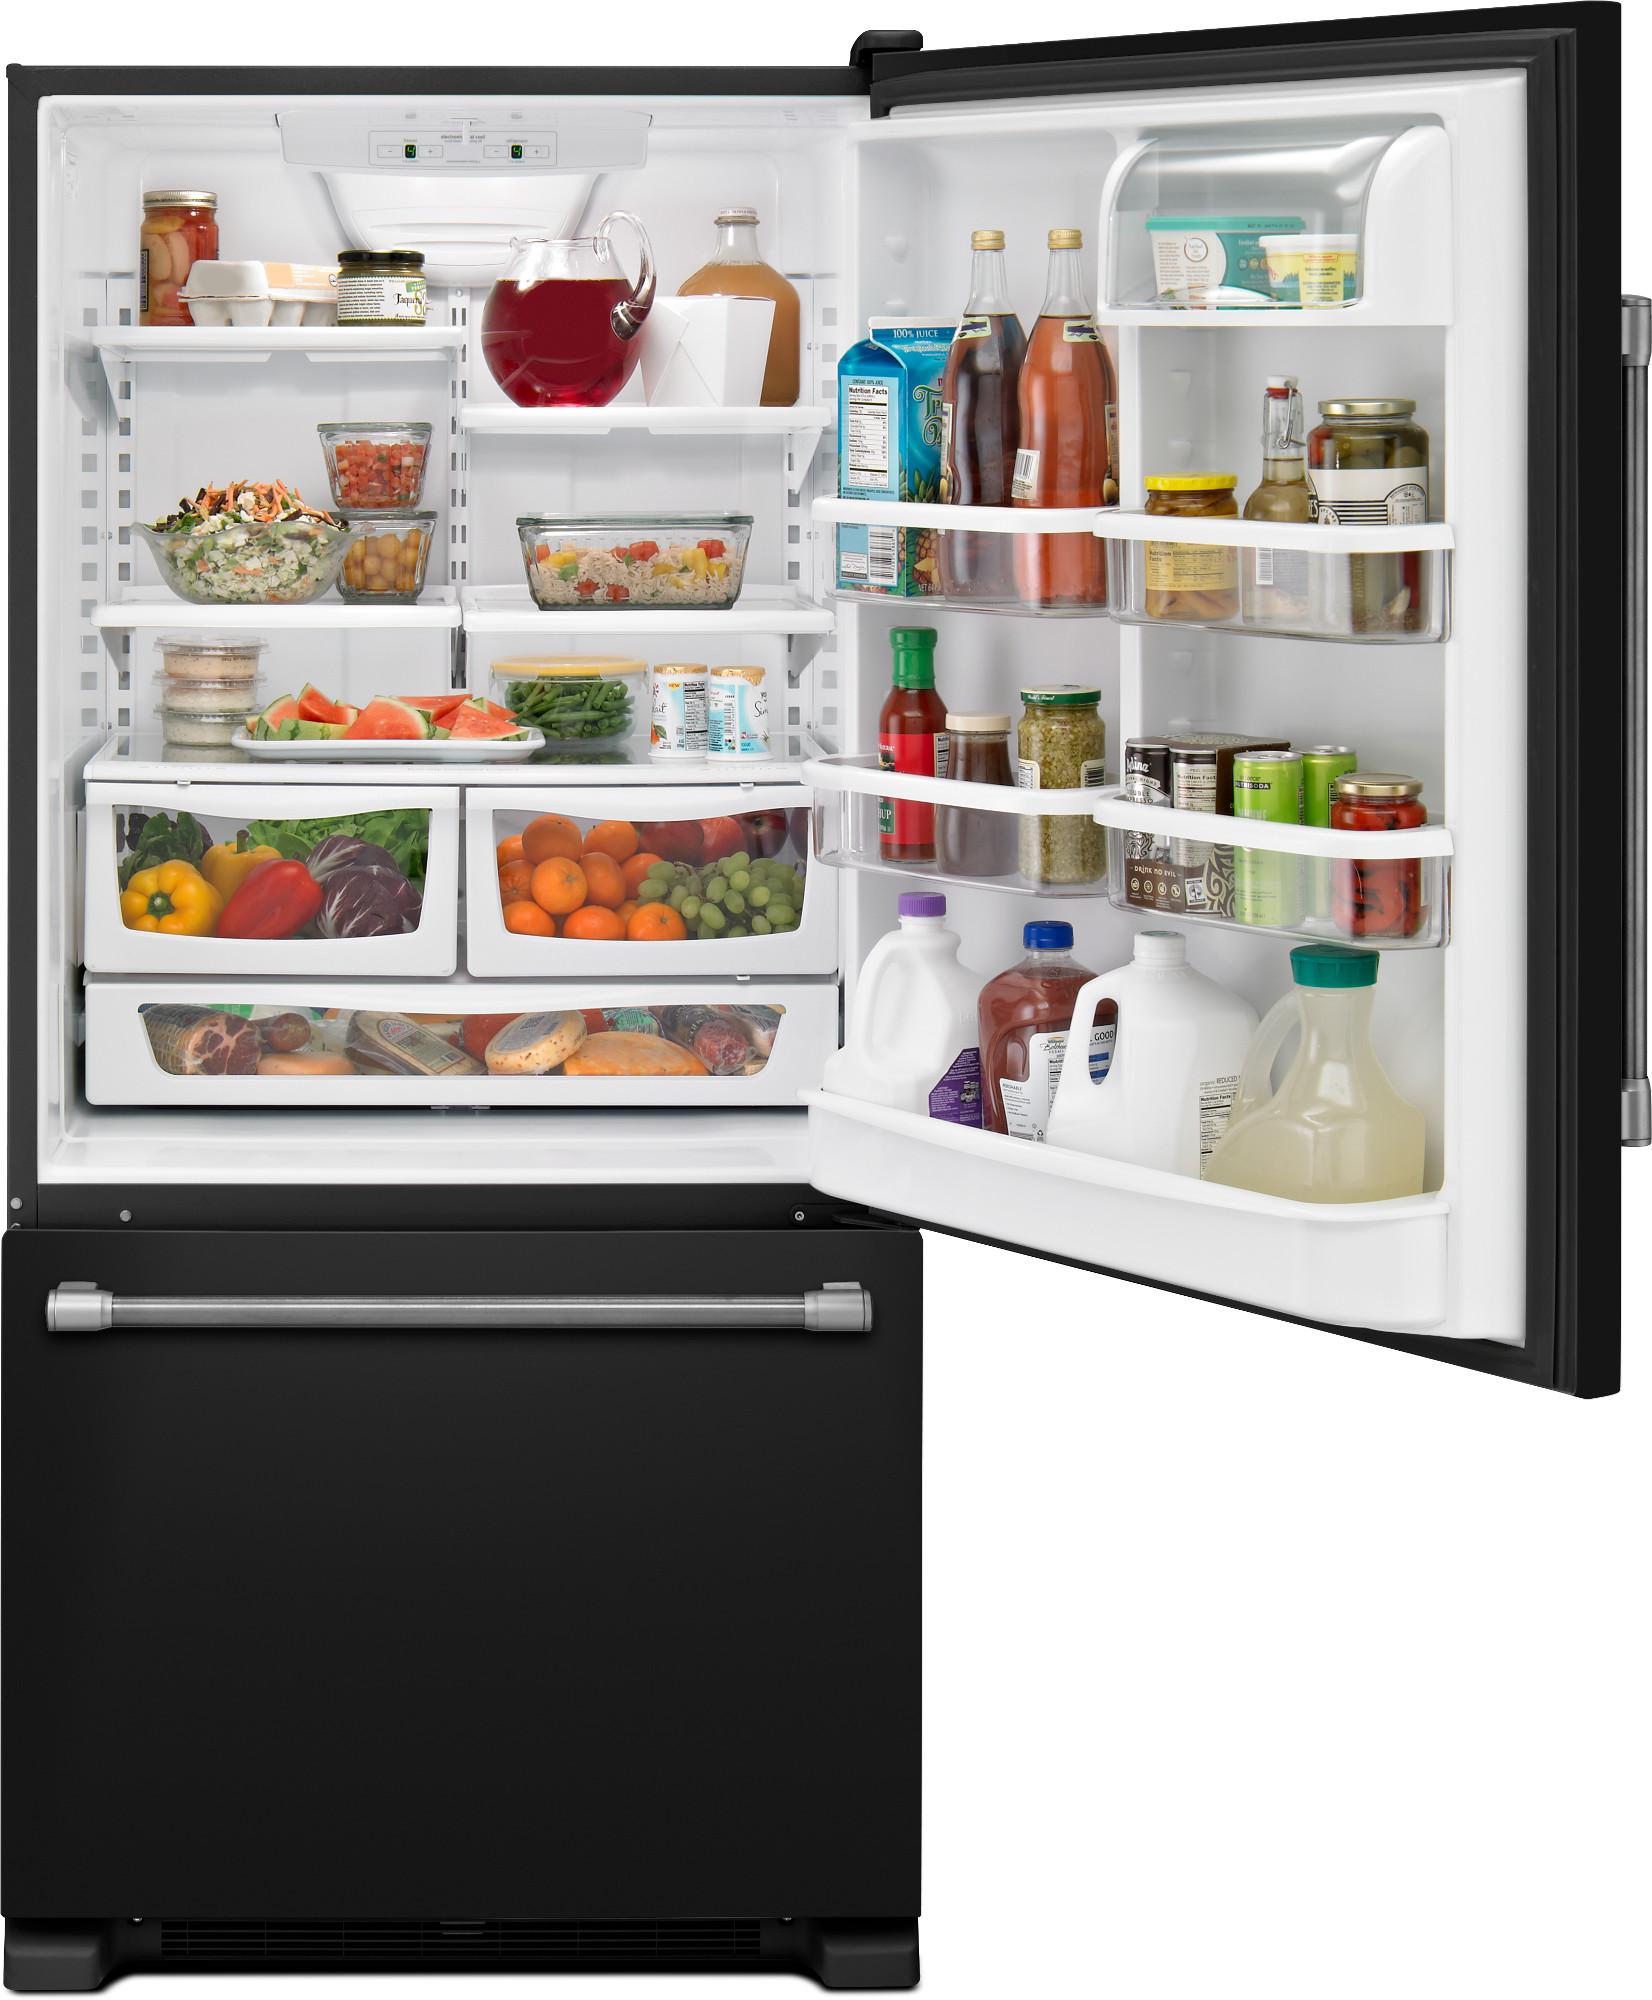 Maytag MBF2258DEE 22 cu. ft. Single Door Bottom Freezer Refrigerator - Black